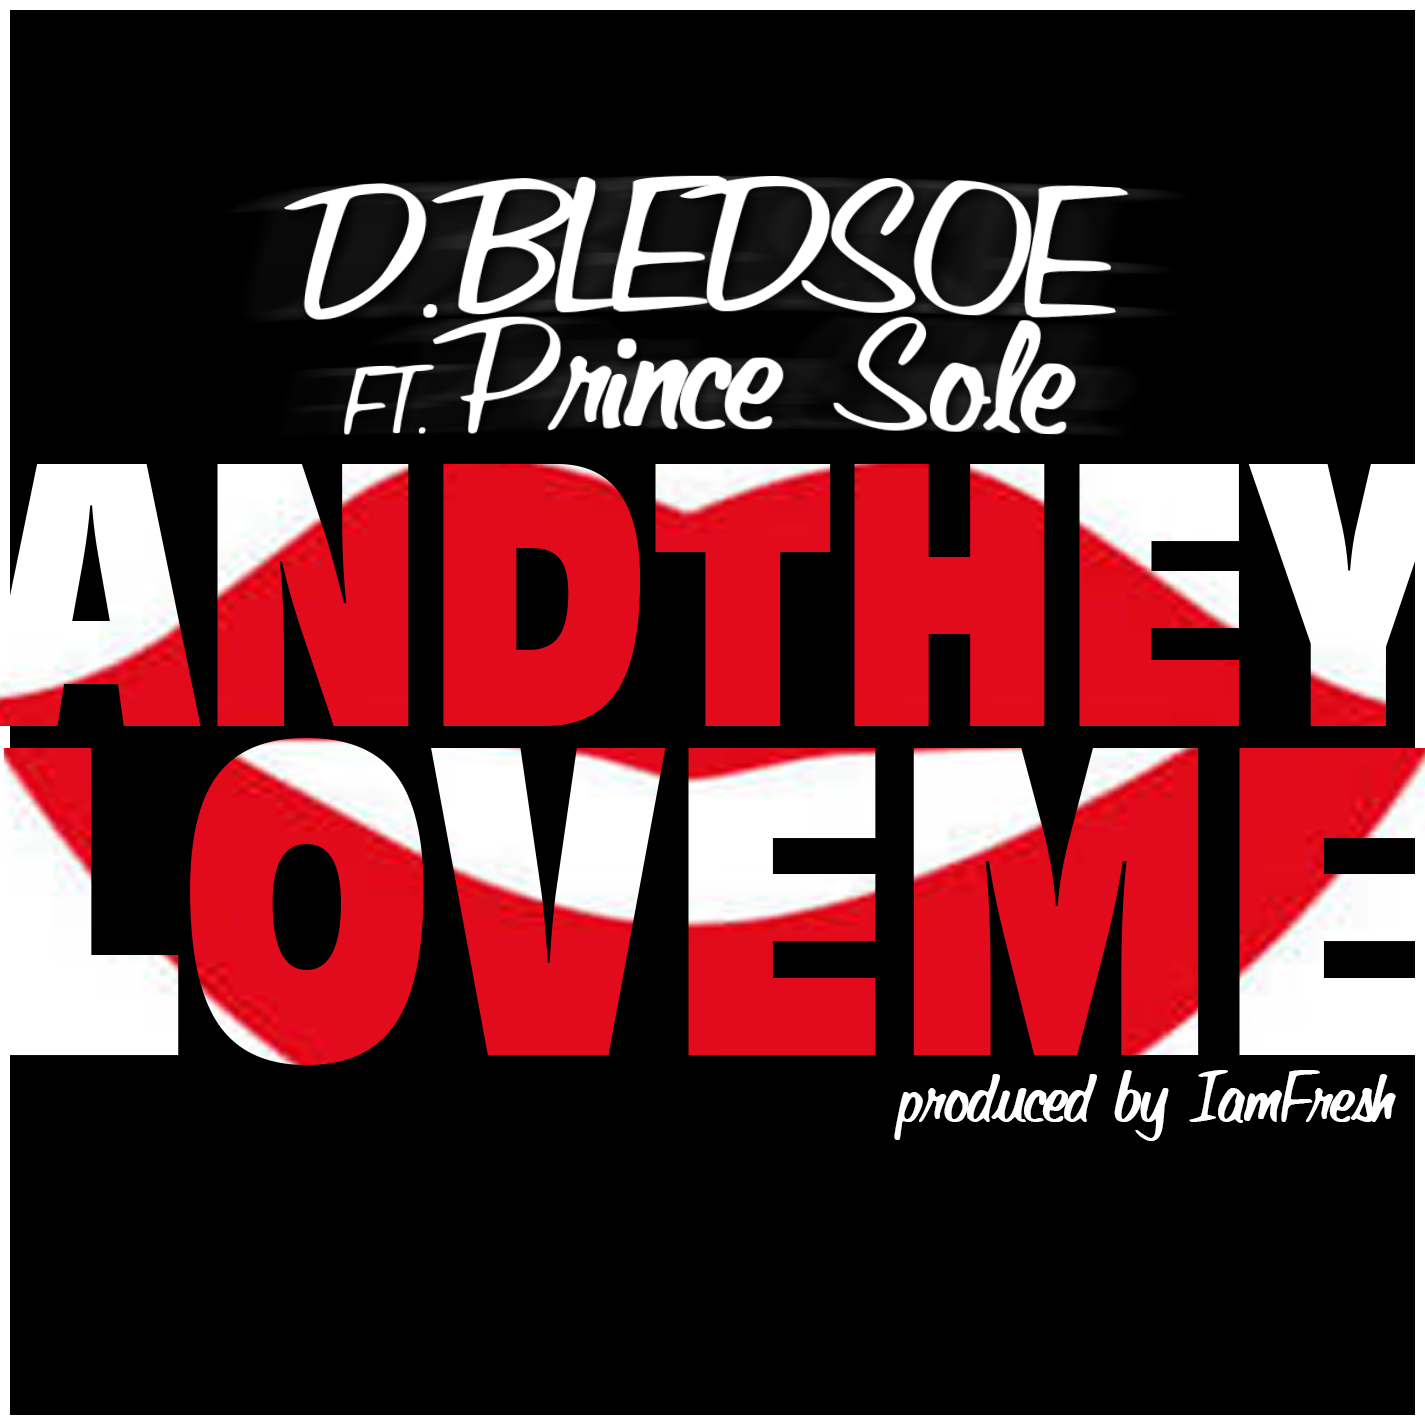 DB-ANDTHEYLOVEME